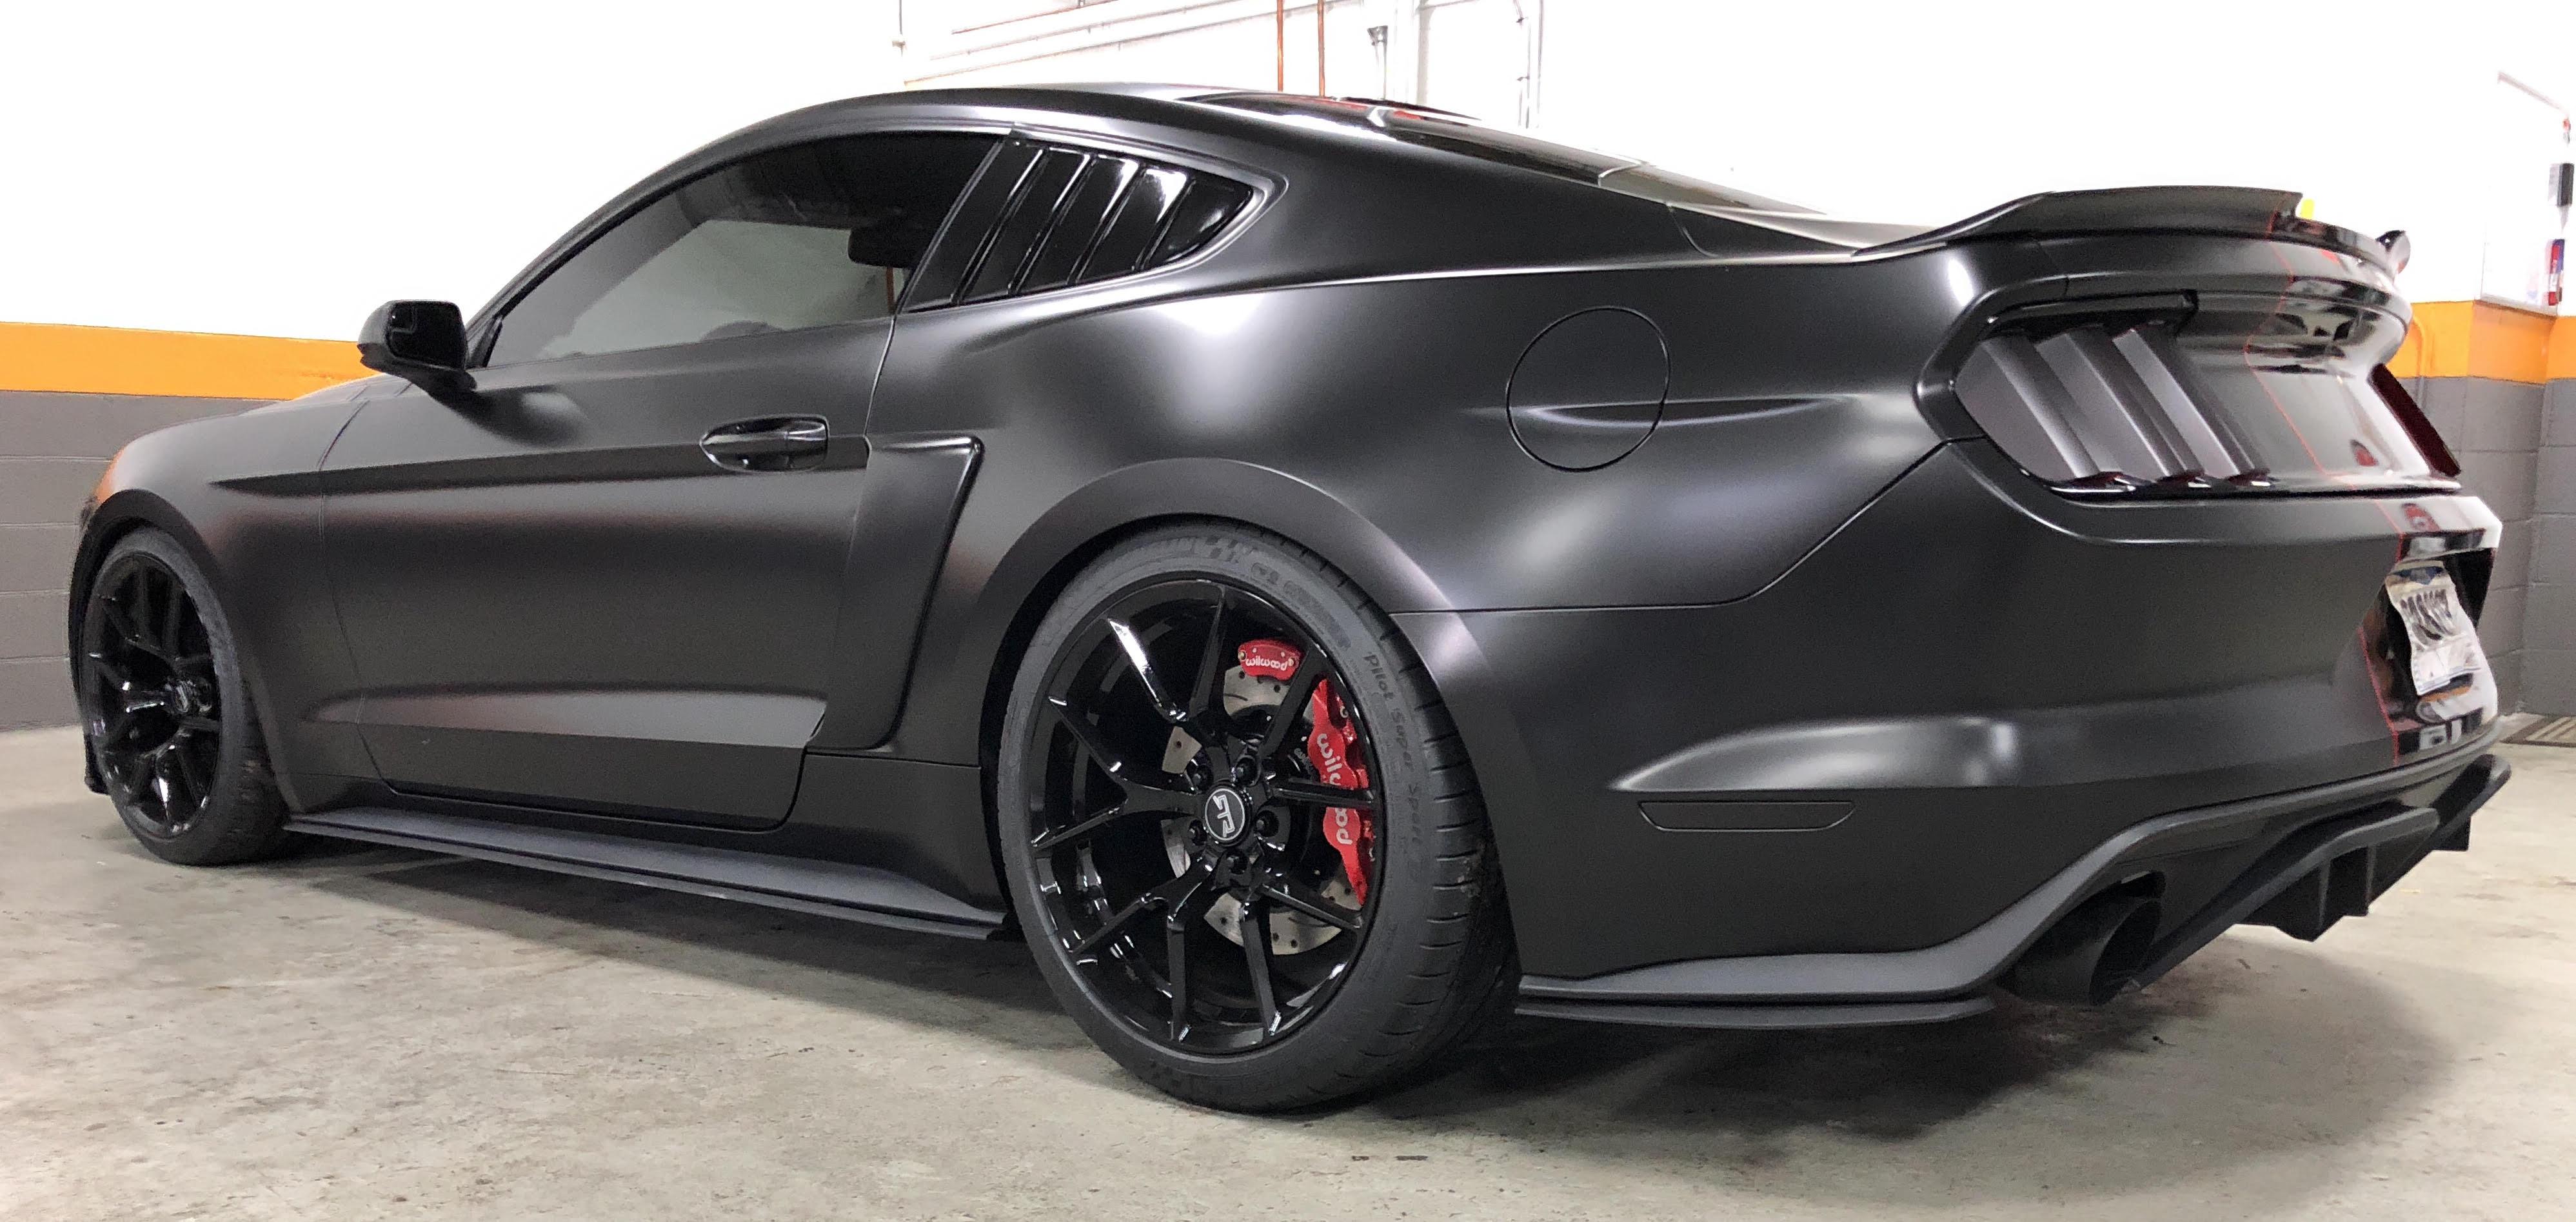 NLC Mustang